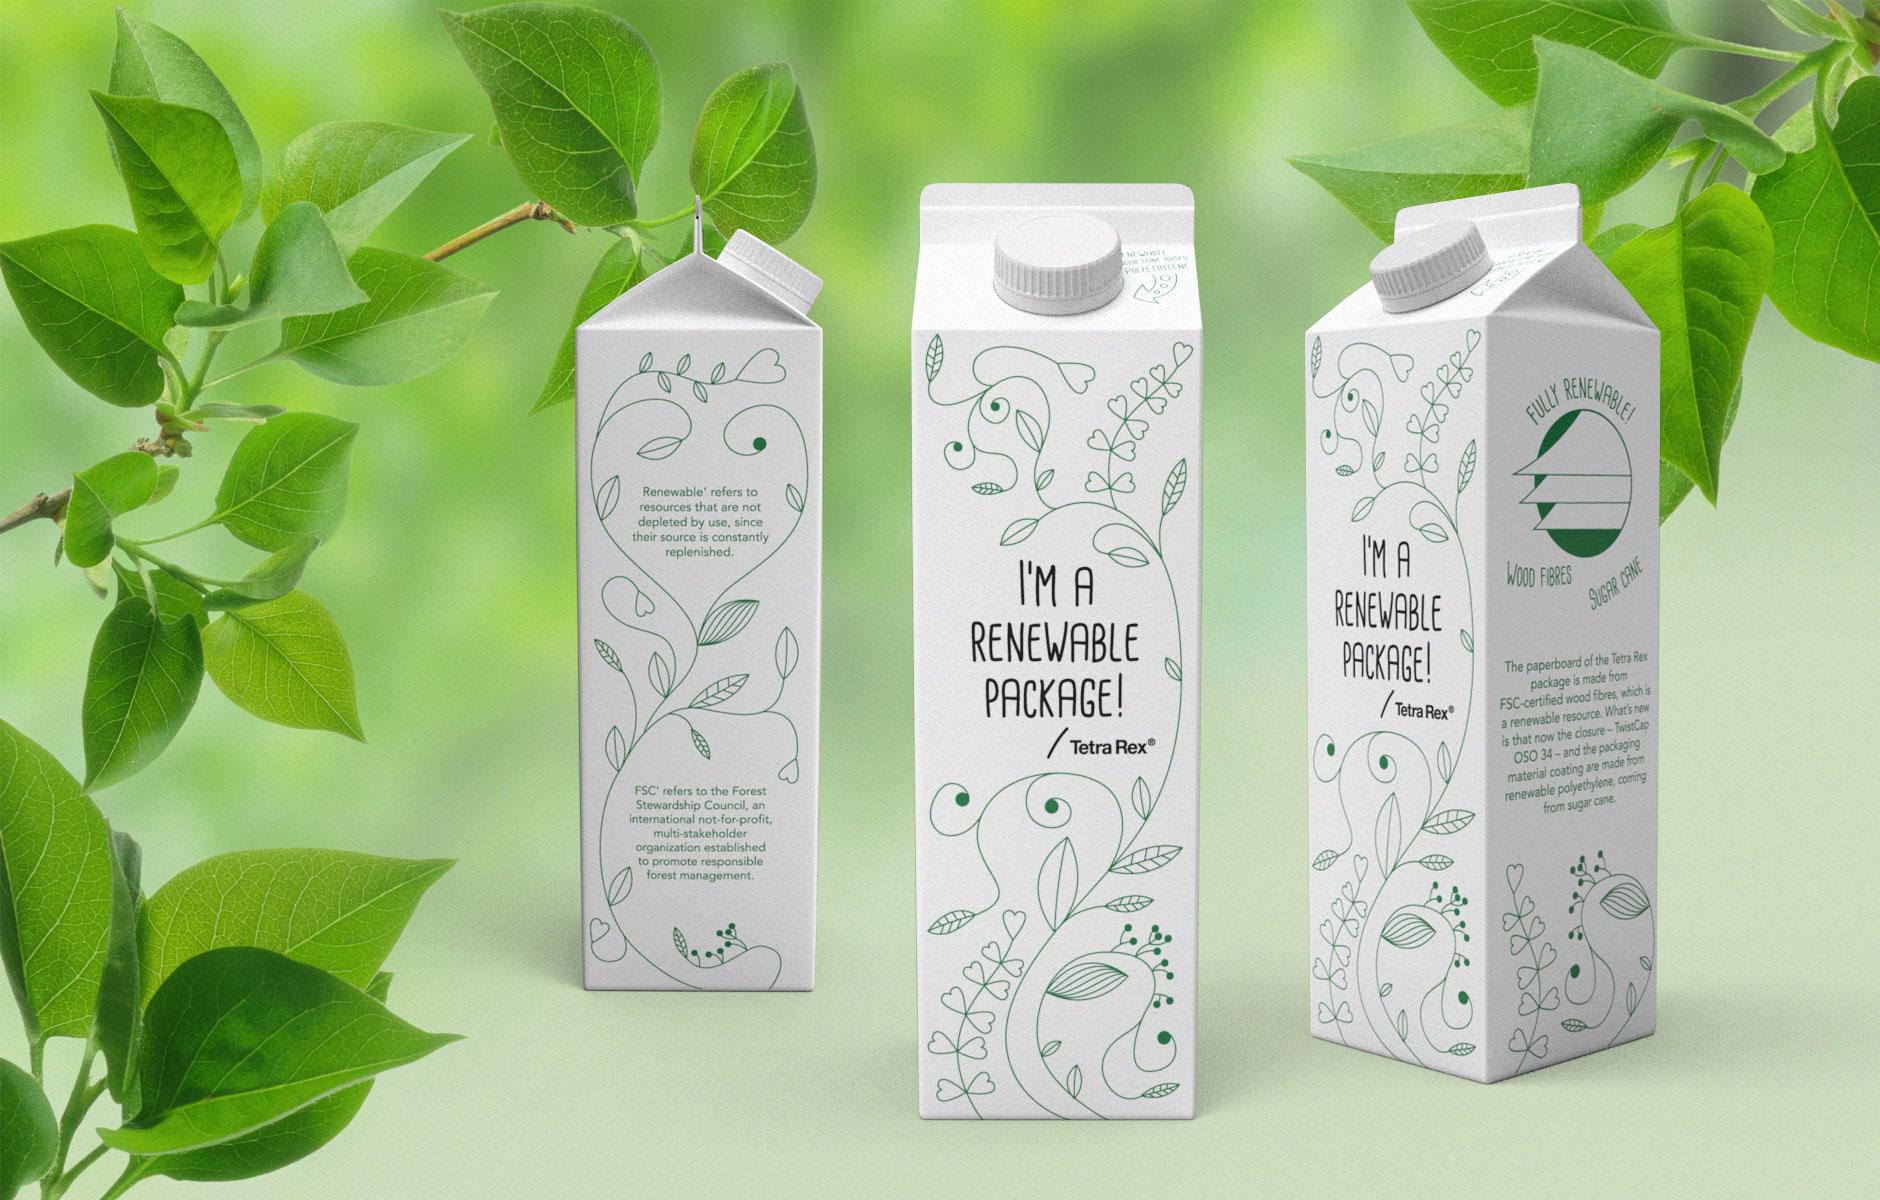 tetra rex renewable packaging material trends 2016